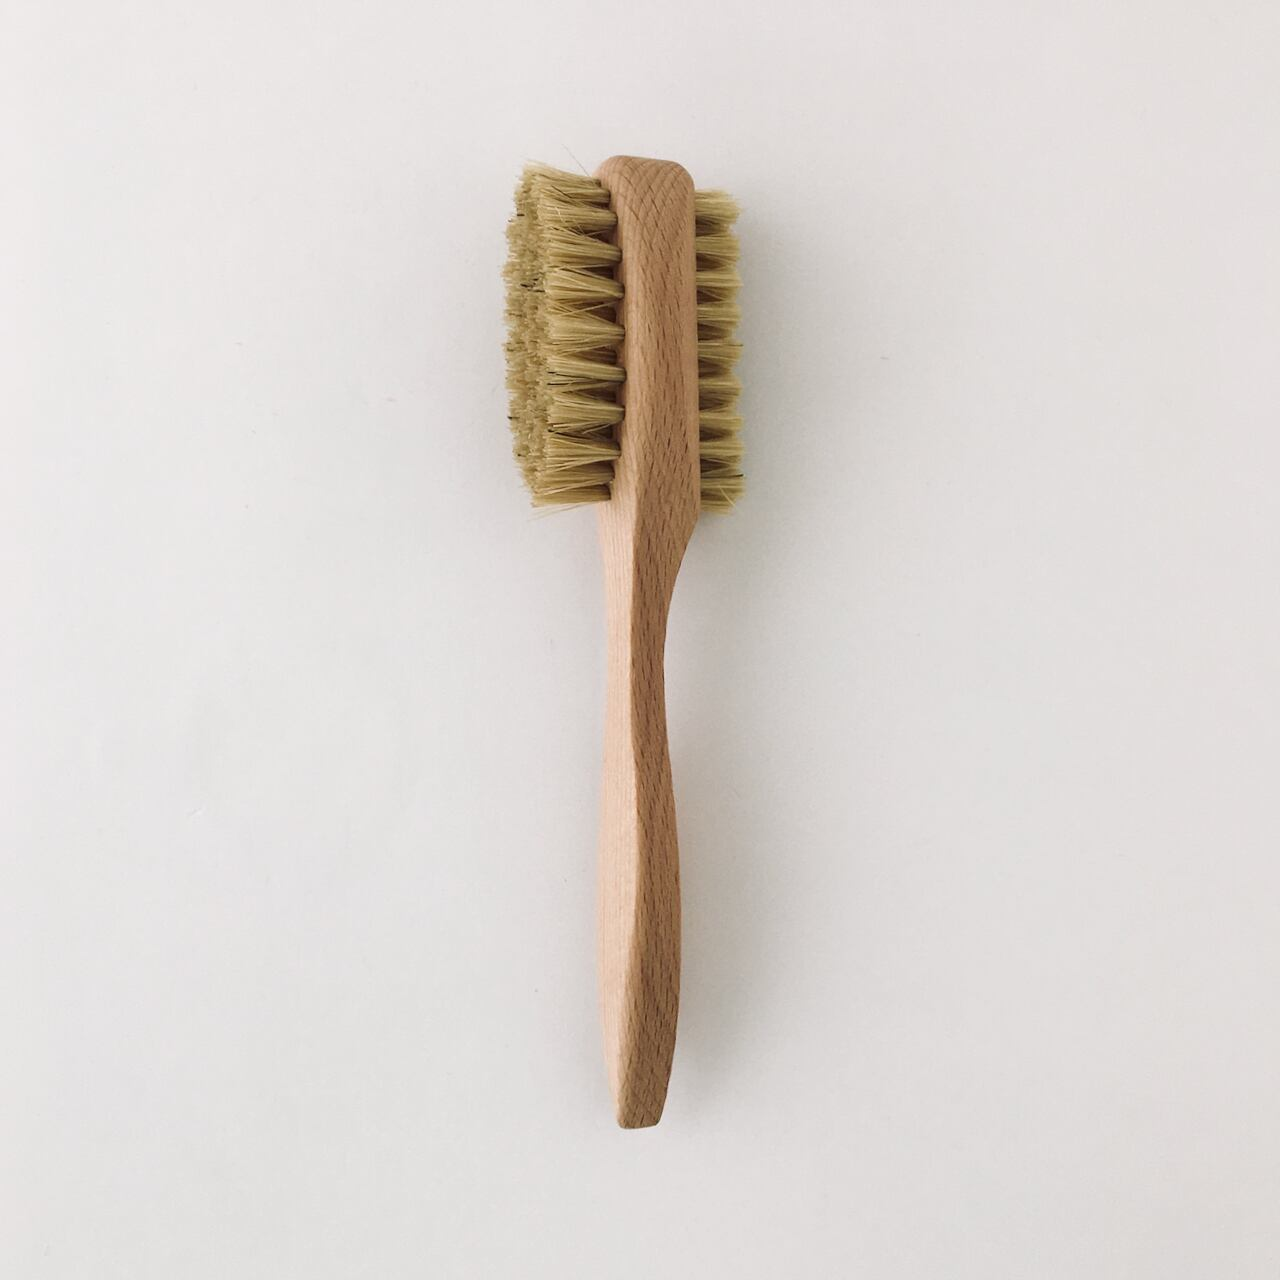 Wooden Nailbrush|ネイルブラシ